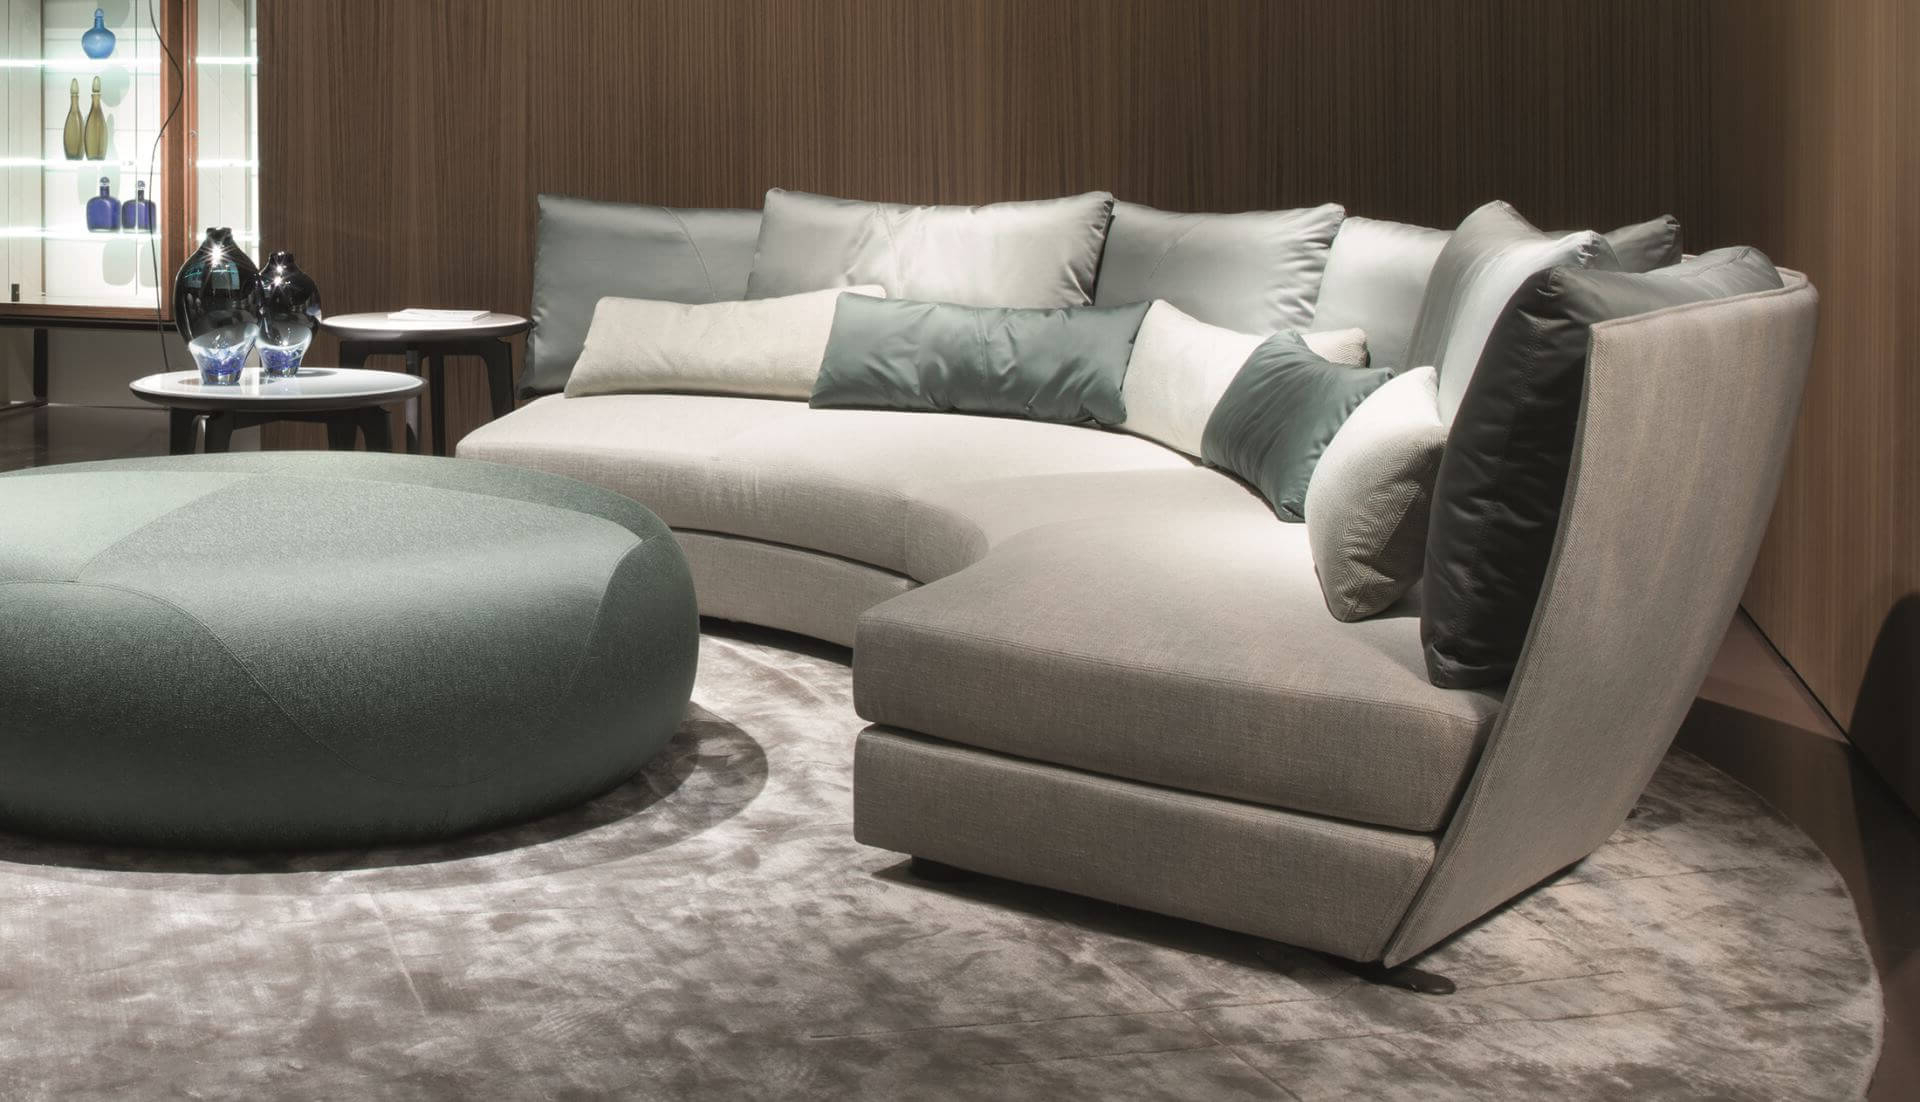 Favorite Giorgetti Dhow Curved Modular Sofa – Dream Design For Dream Navy 2 Piece Modular Sofas (View 1 of 20)